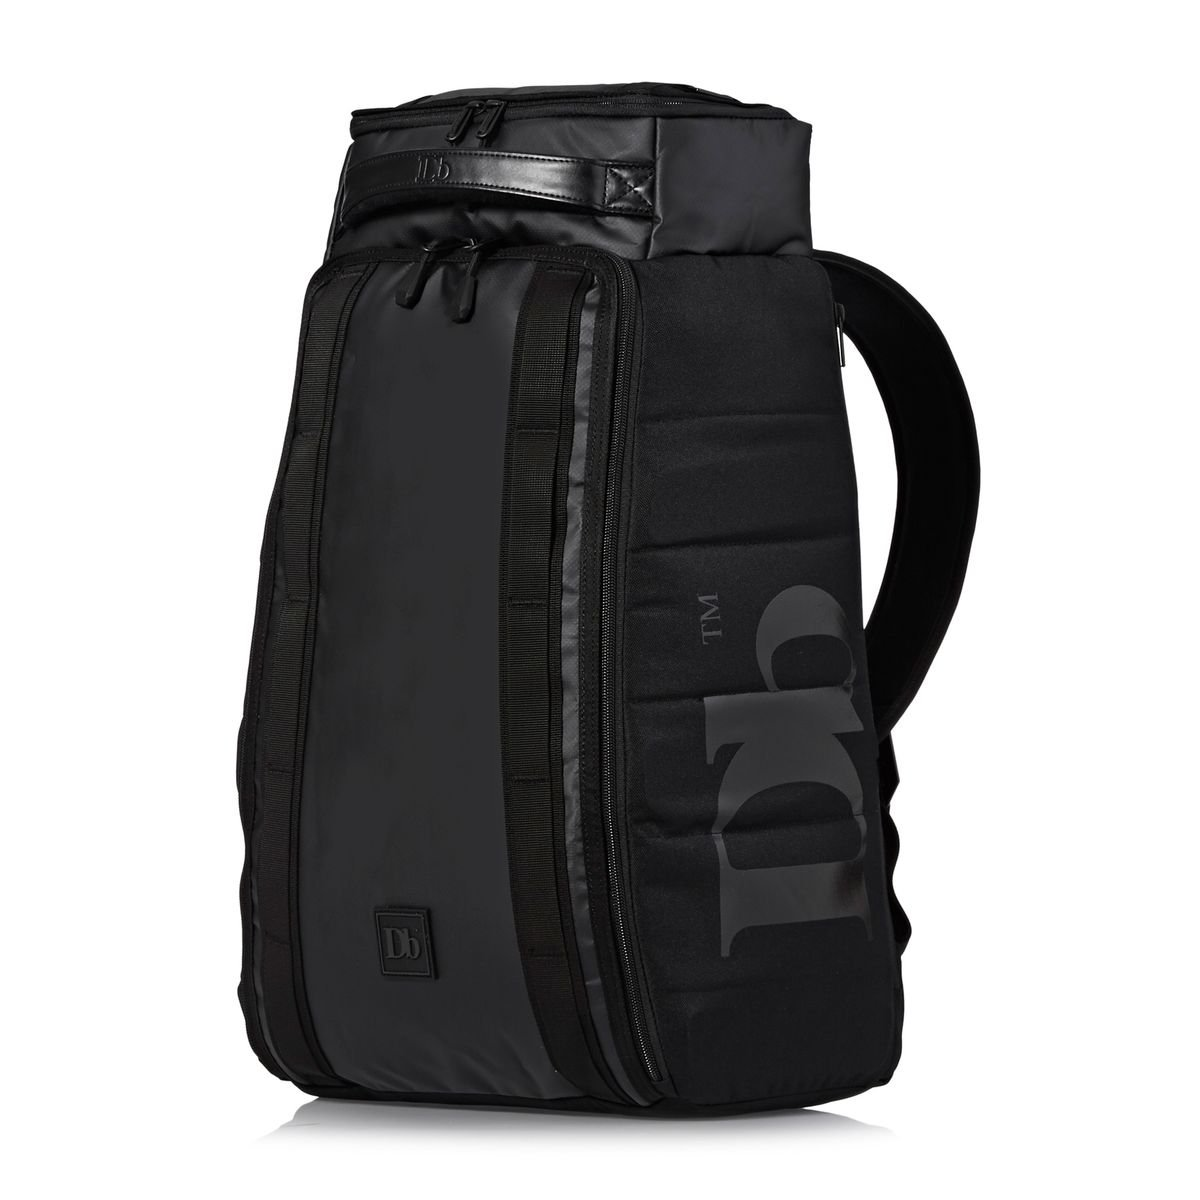 Douchebag Hugger 30L - Black Out Rucksack 56 x 42 x 5.5 cm